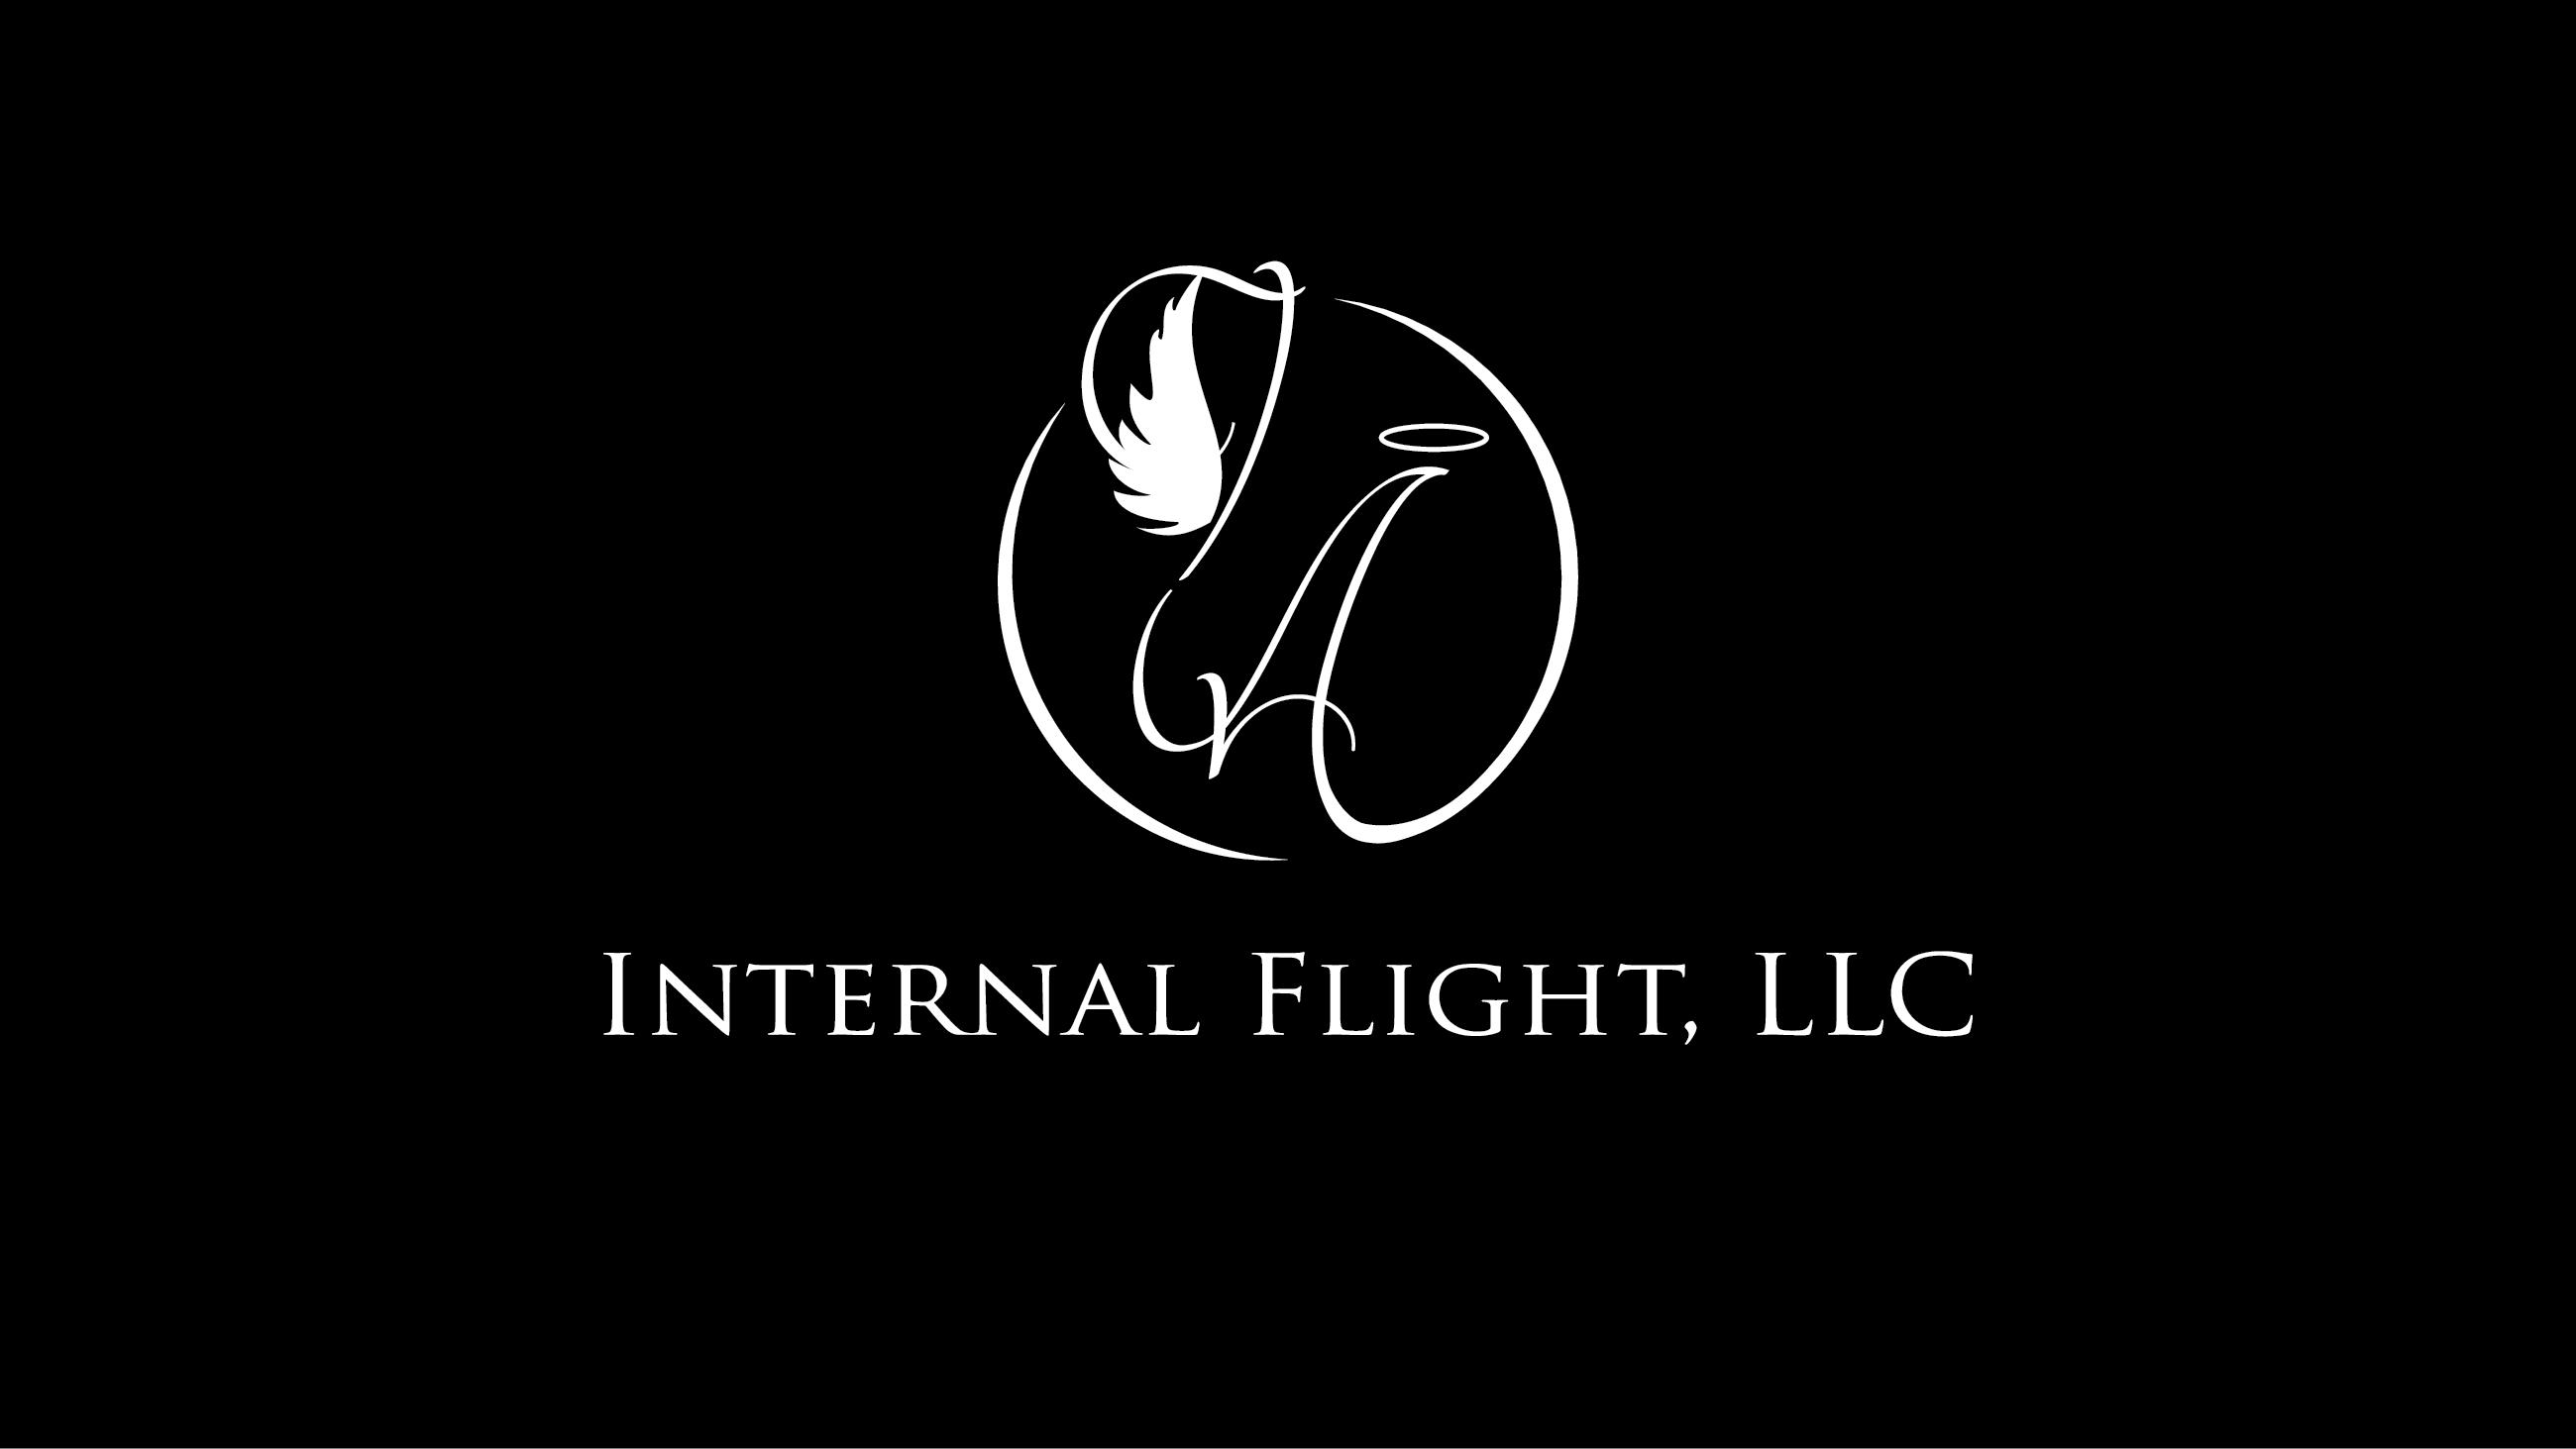 Internal Flight, LLC company Logo